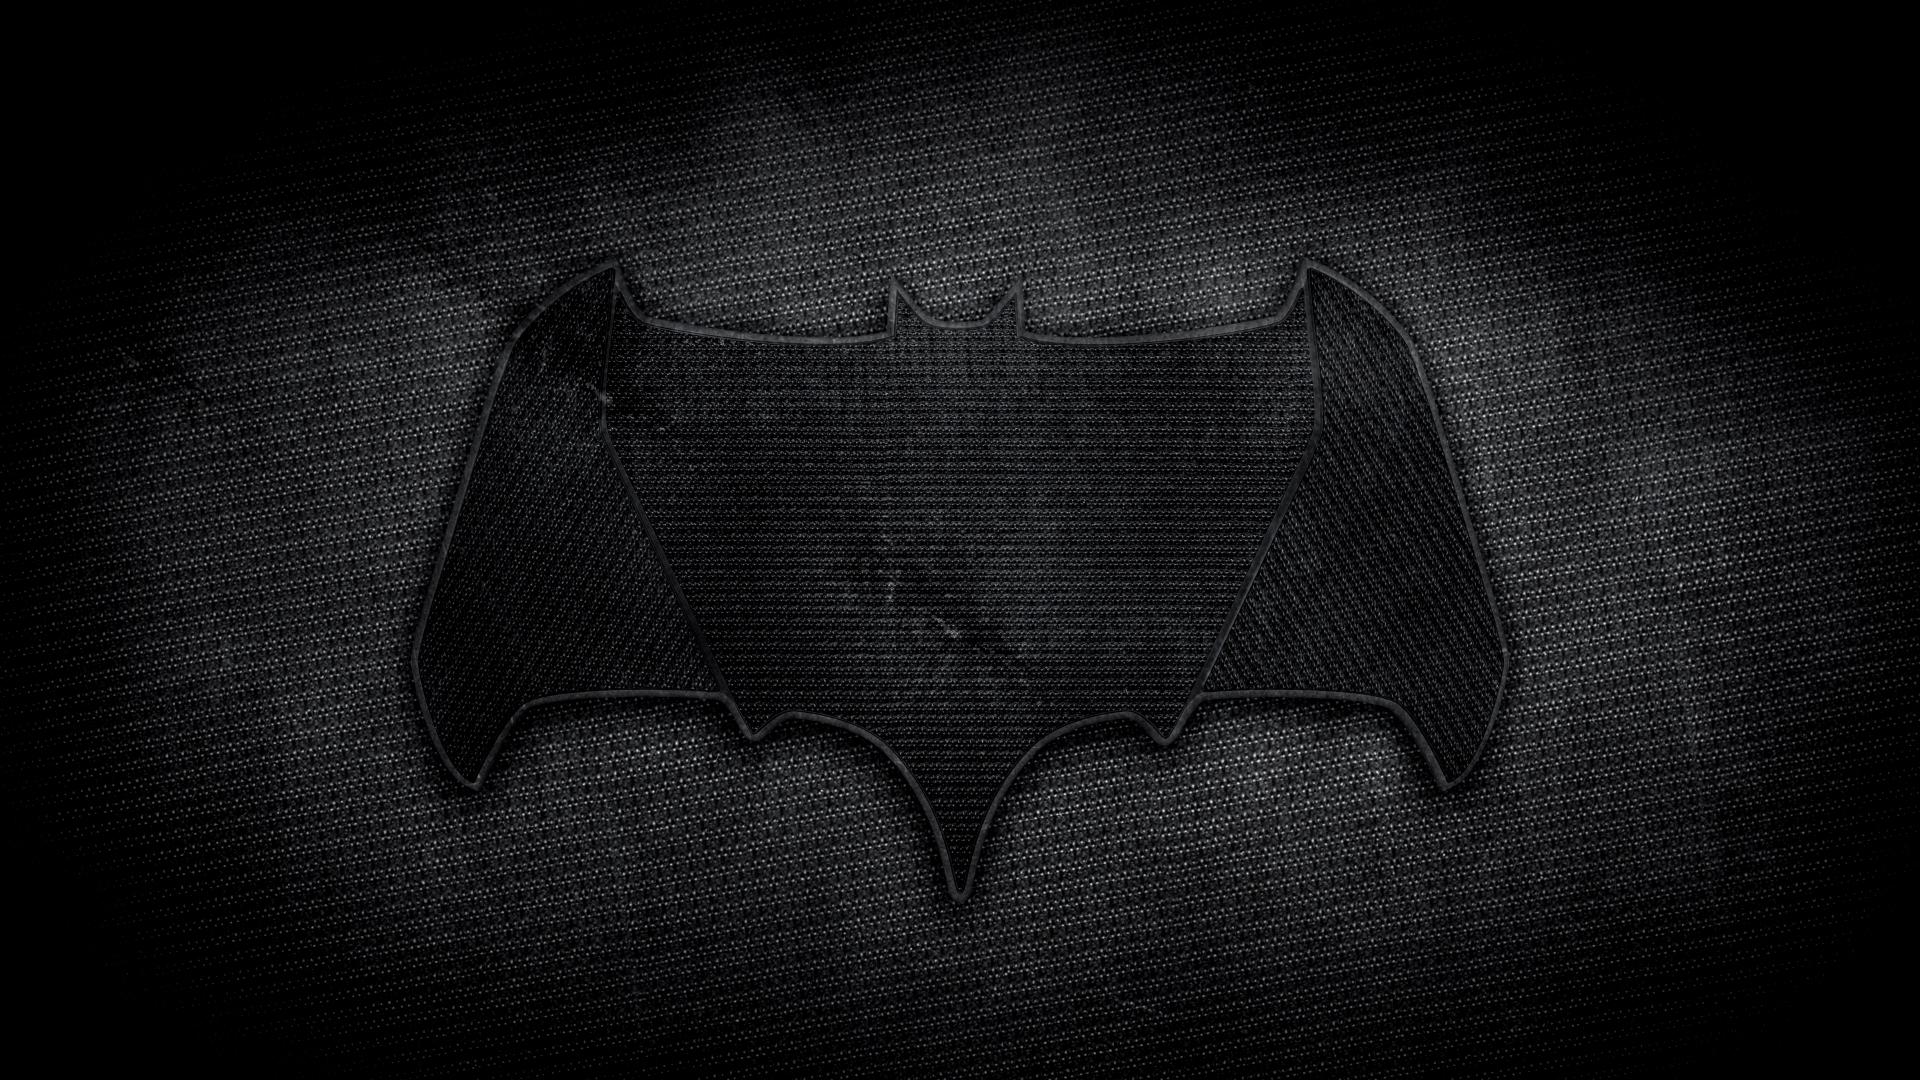 Batman Logo In Vs Superman Dawn Of Justice Movie 2016 1920x1080